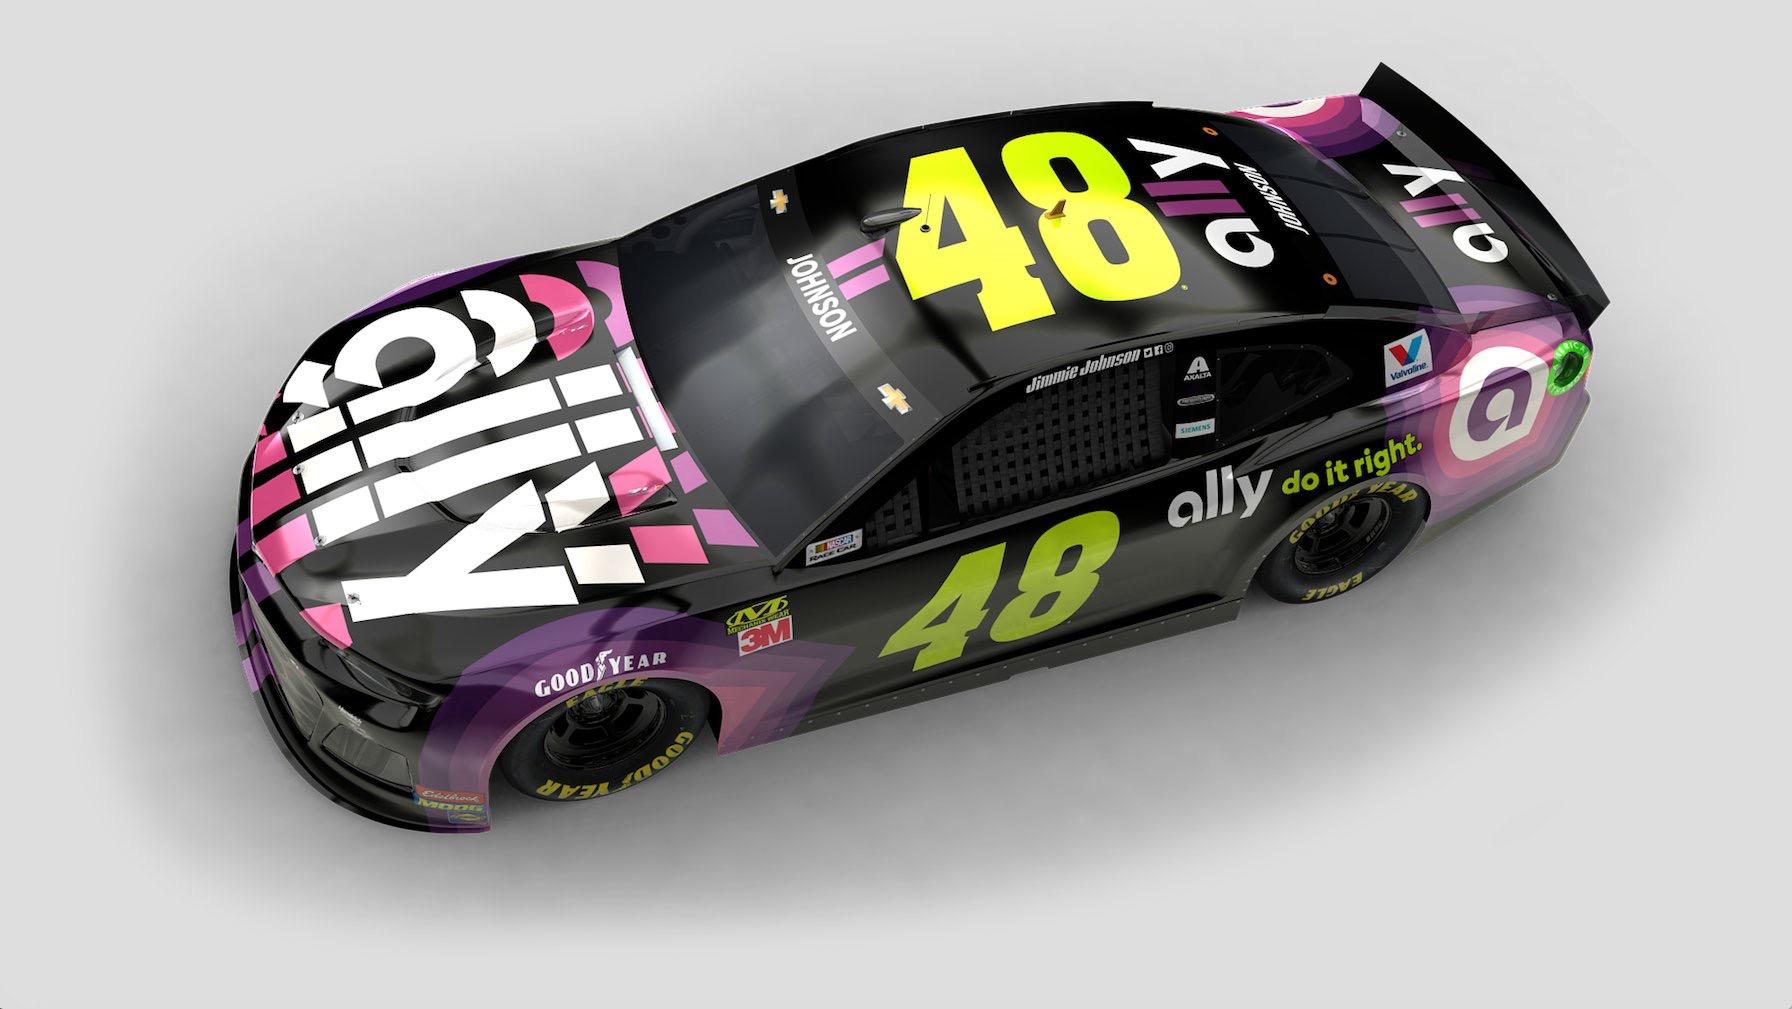 48-1 car.jpeg